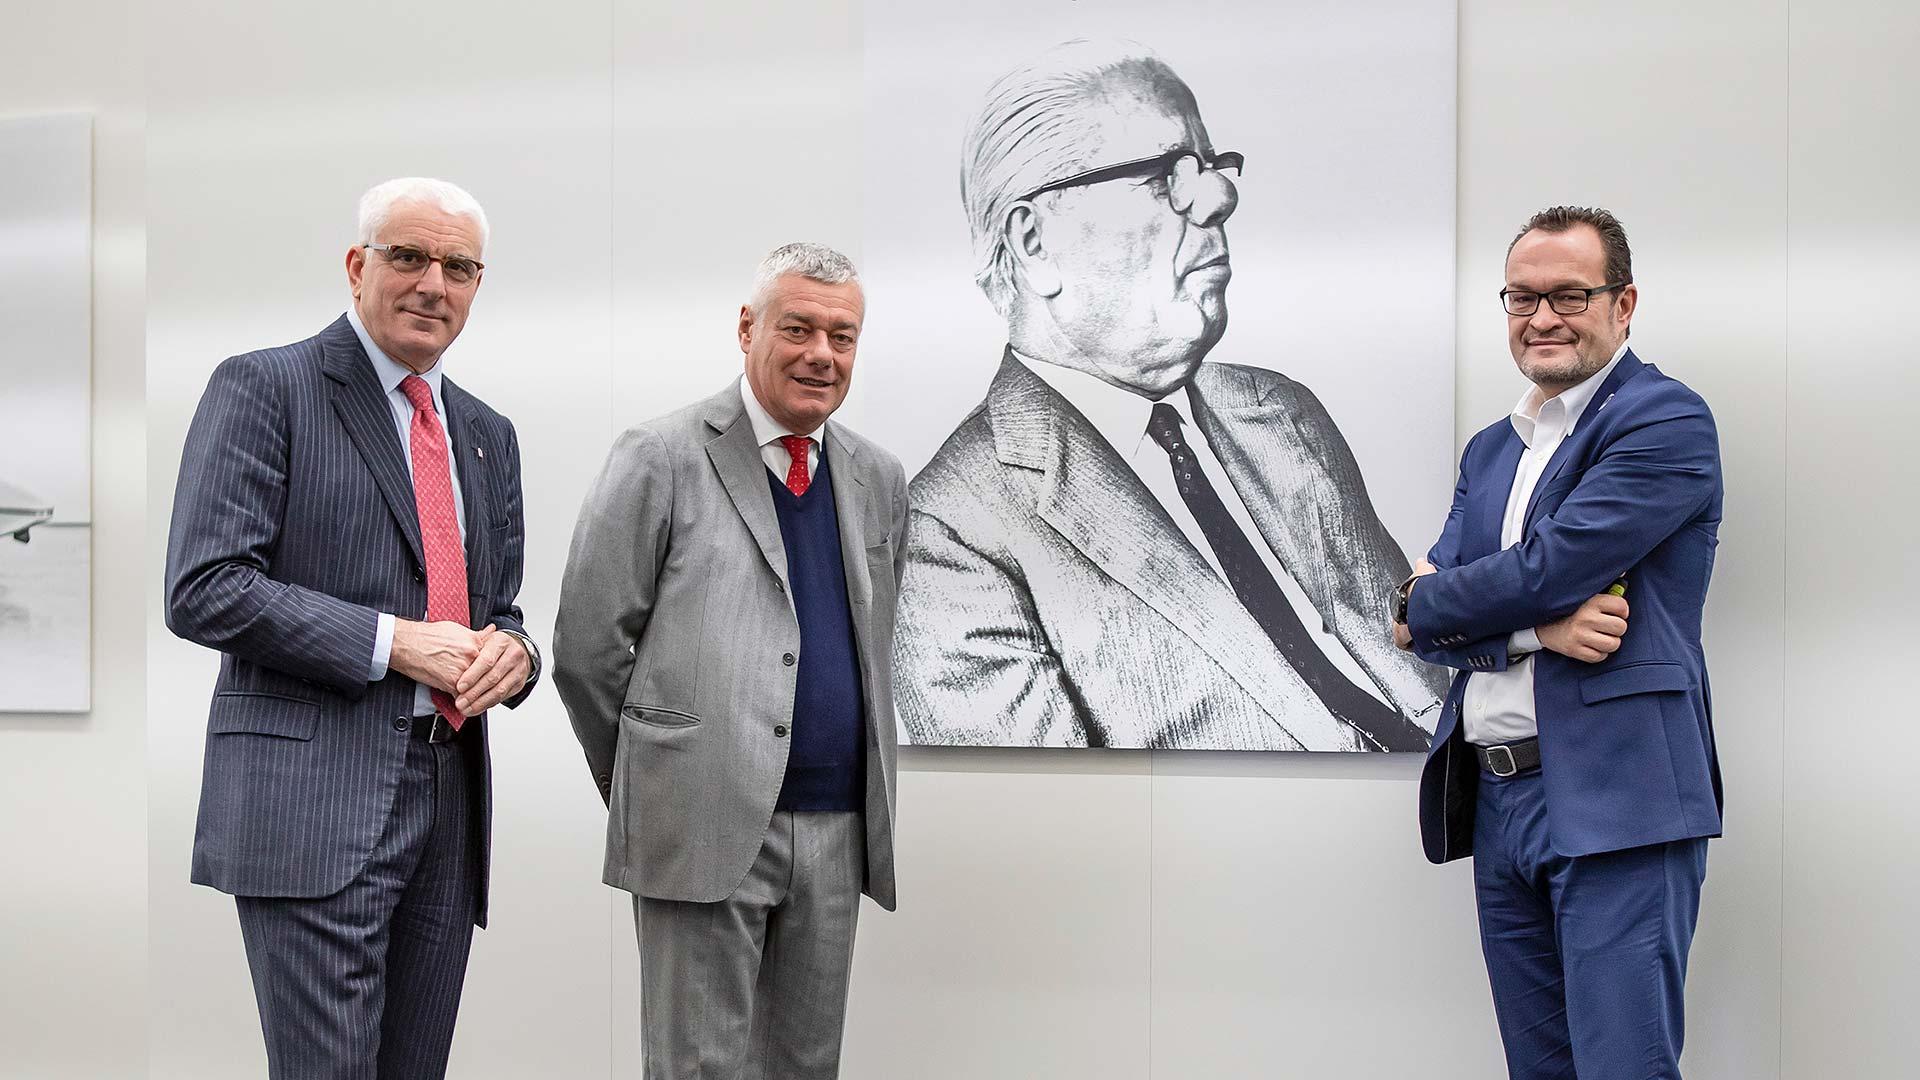 Silvio Pietro Angori, Paolo Pininfarina and Michael Perschke